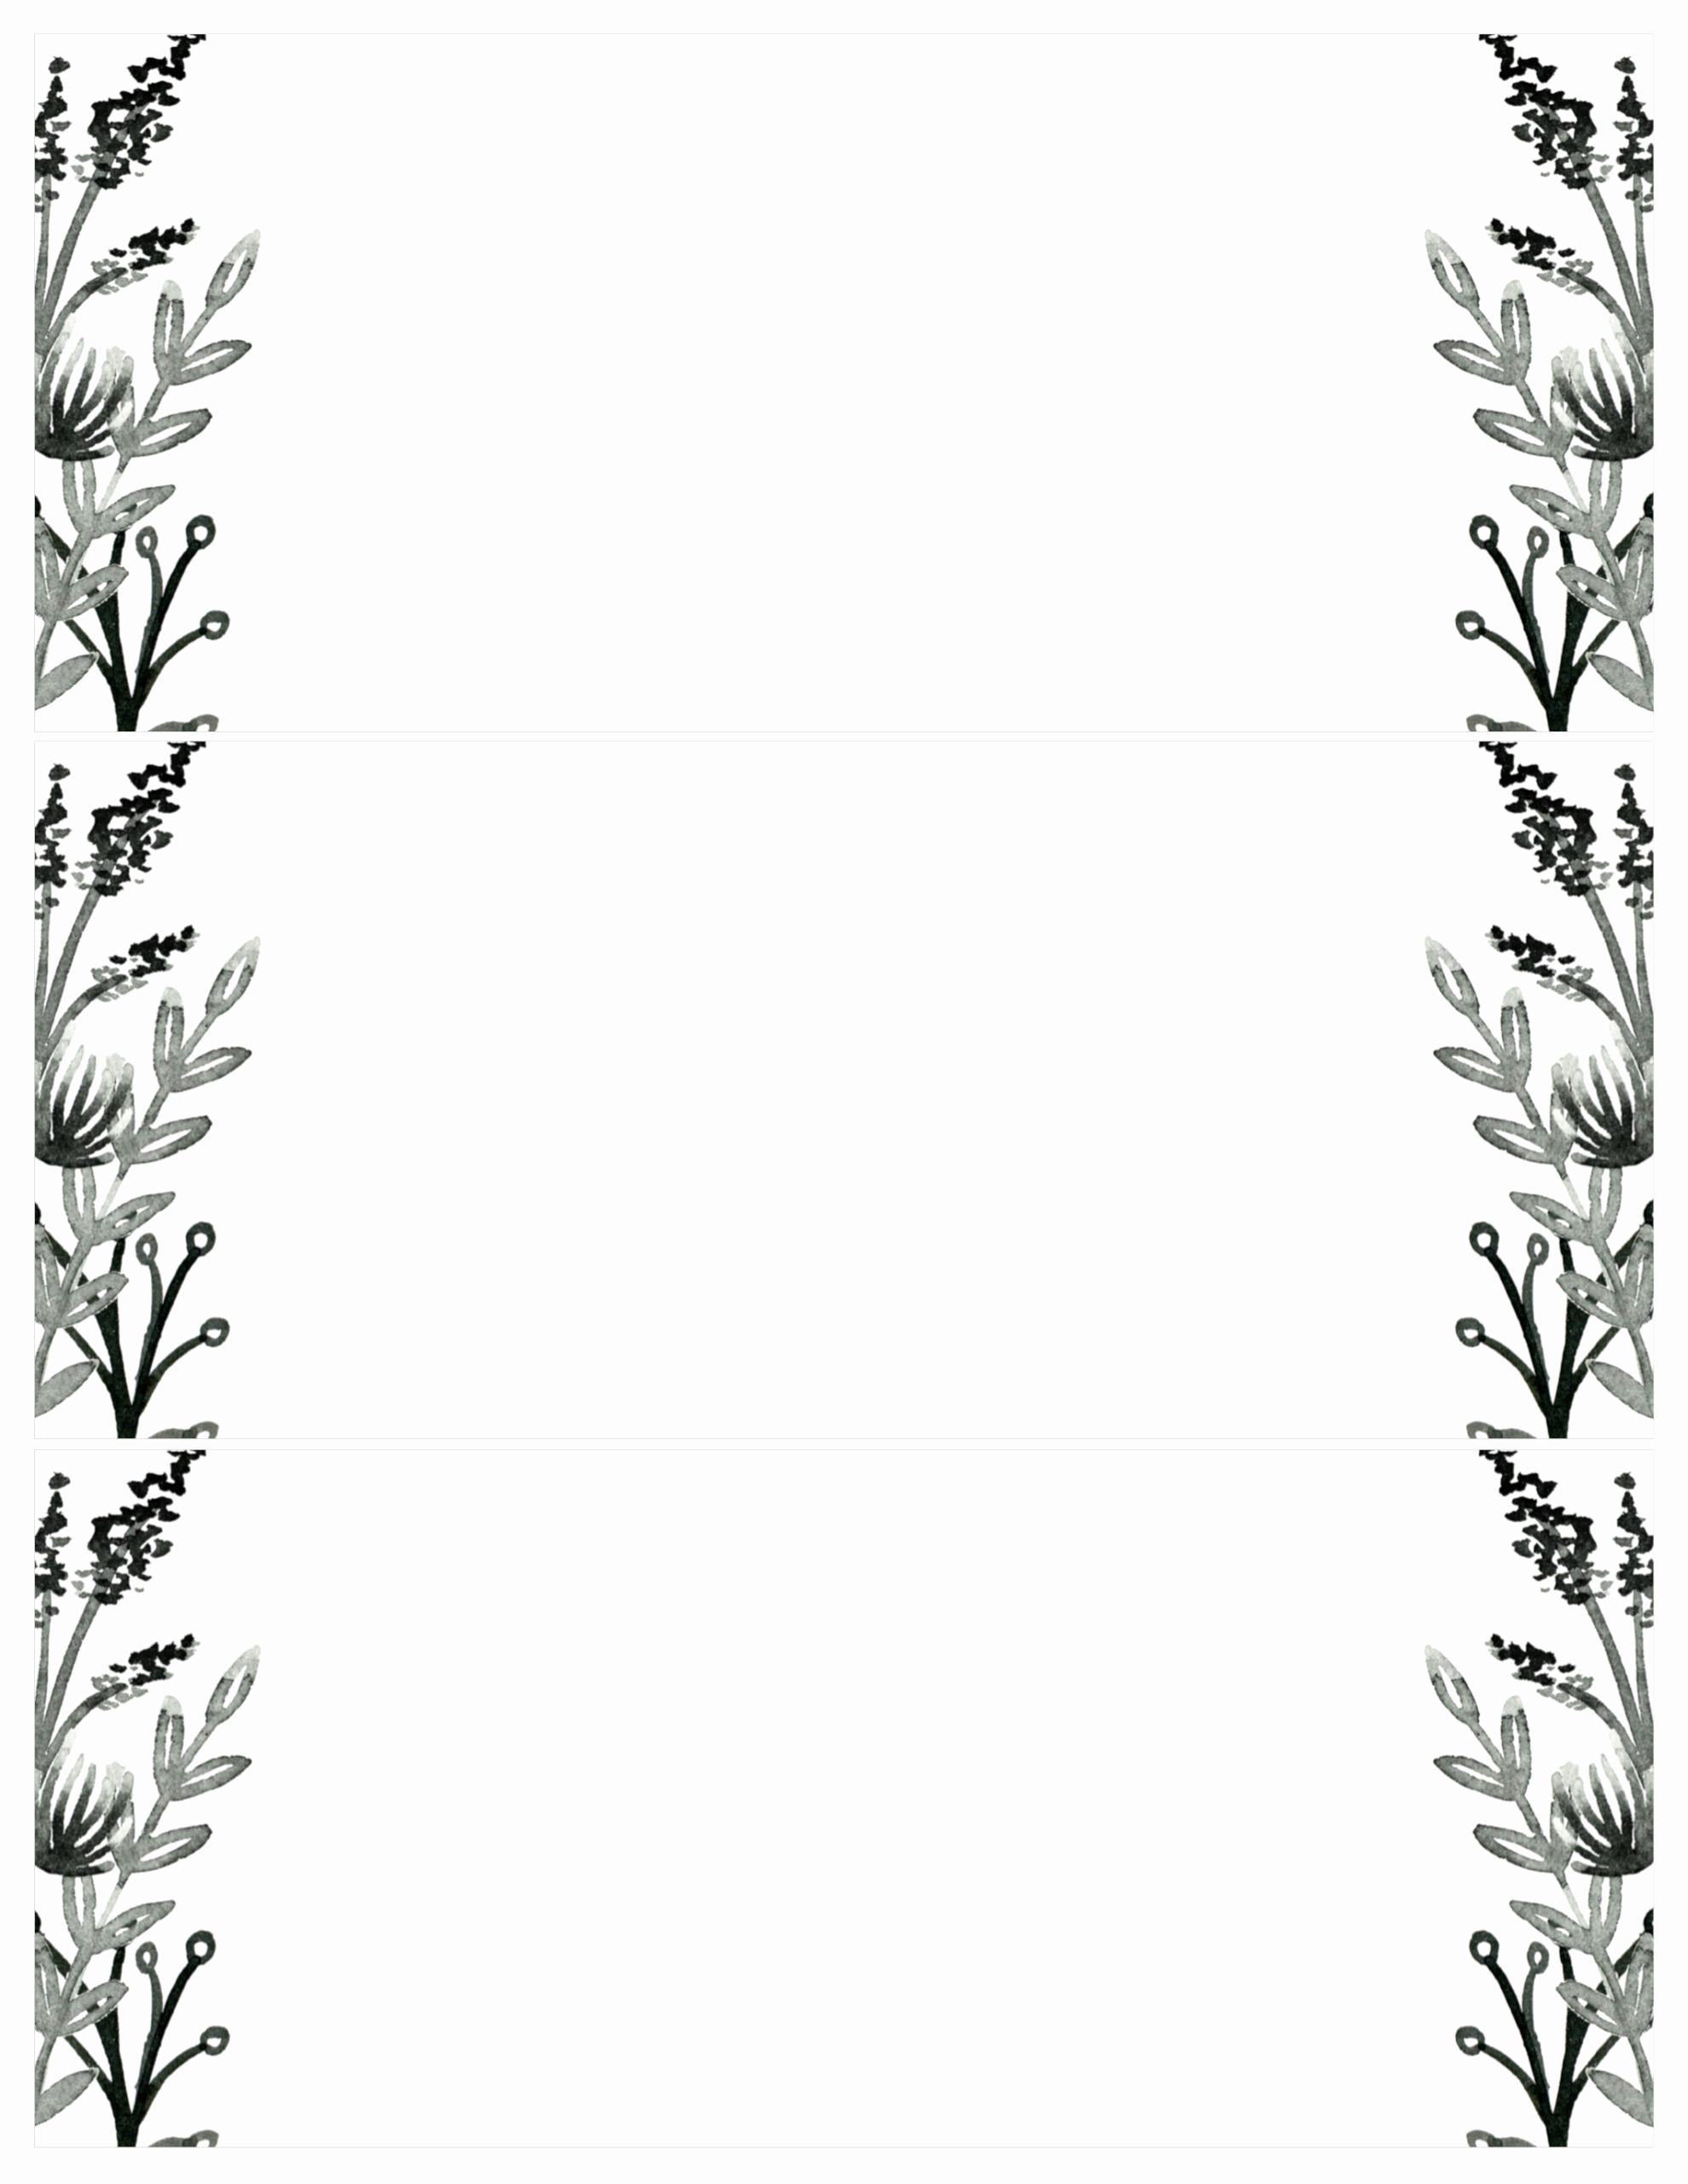 Free Templates for Invitations Beautiful Black White Flowers Invitations Templates Free Printable